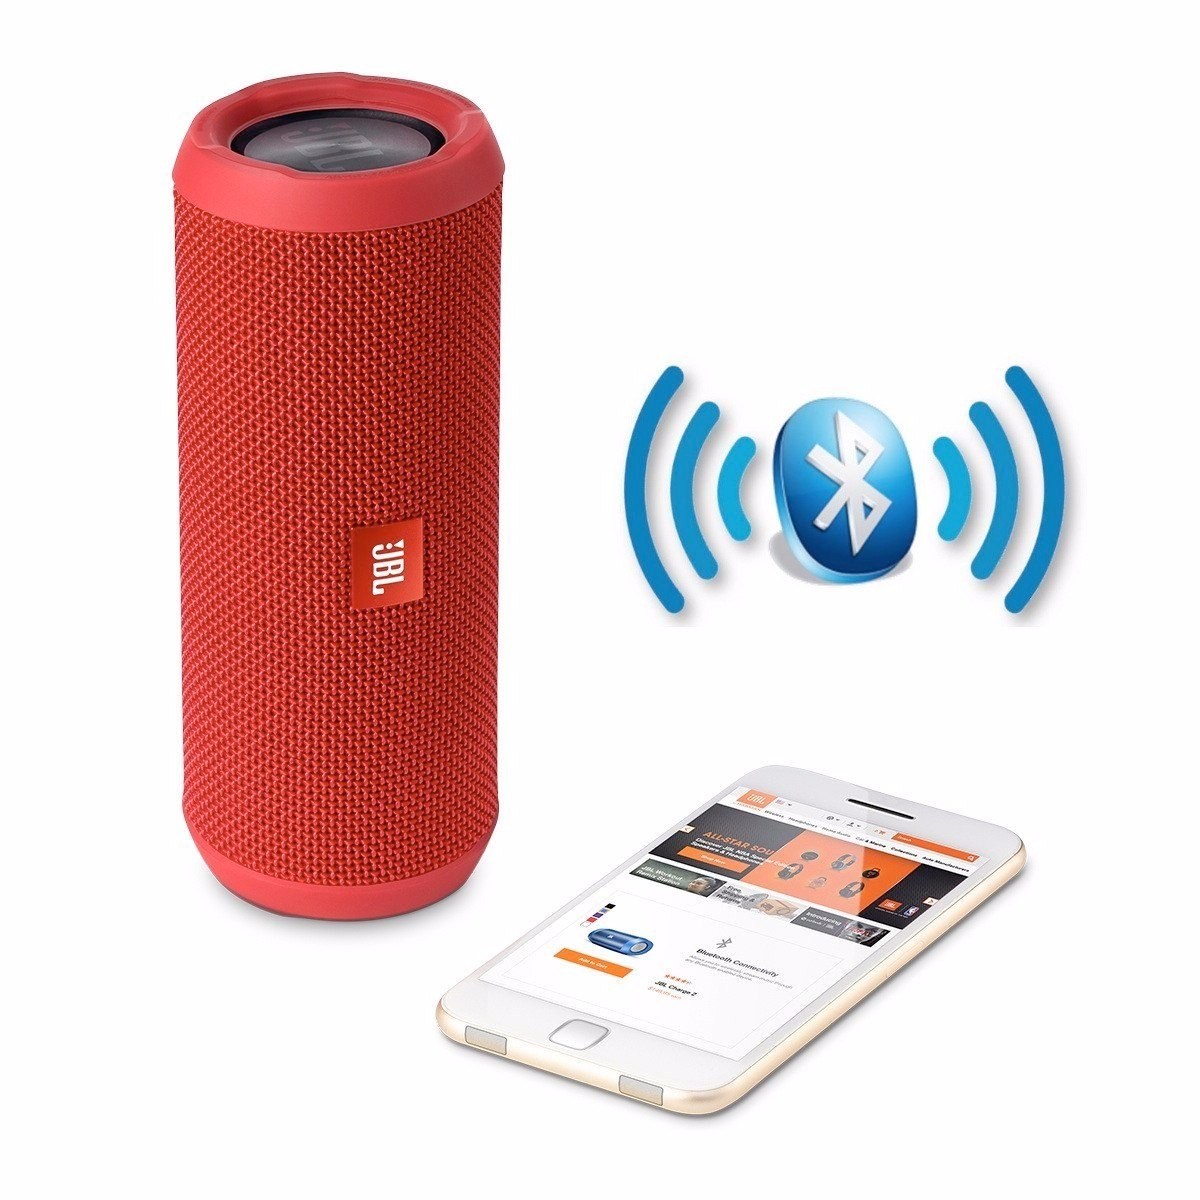 jbl flip 3 speaker caixa de som portatil bluetooth original r 409 99 em mercado livre. Black Bedroom Furniture Sets. Home Design Ideas